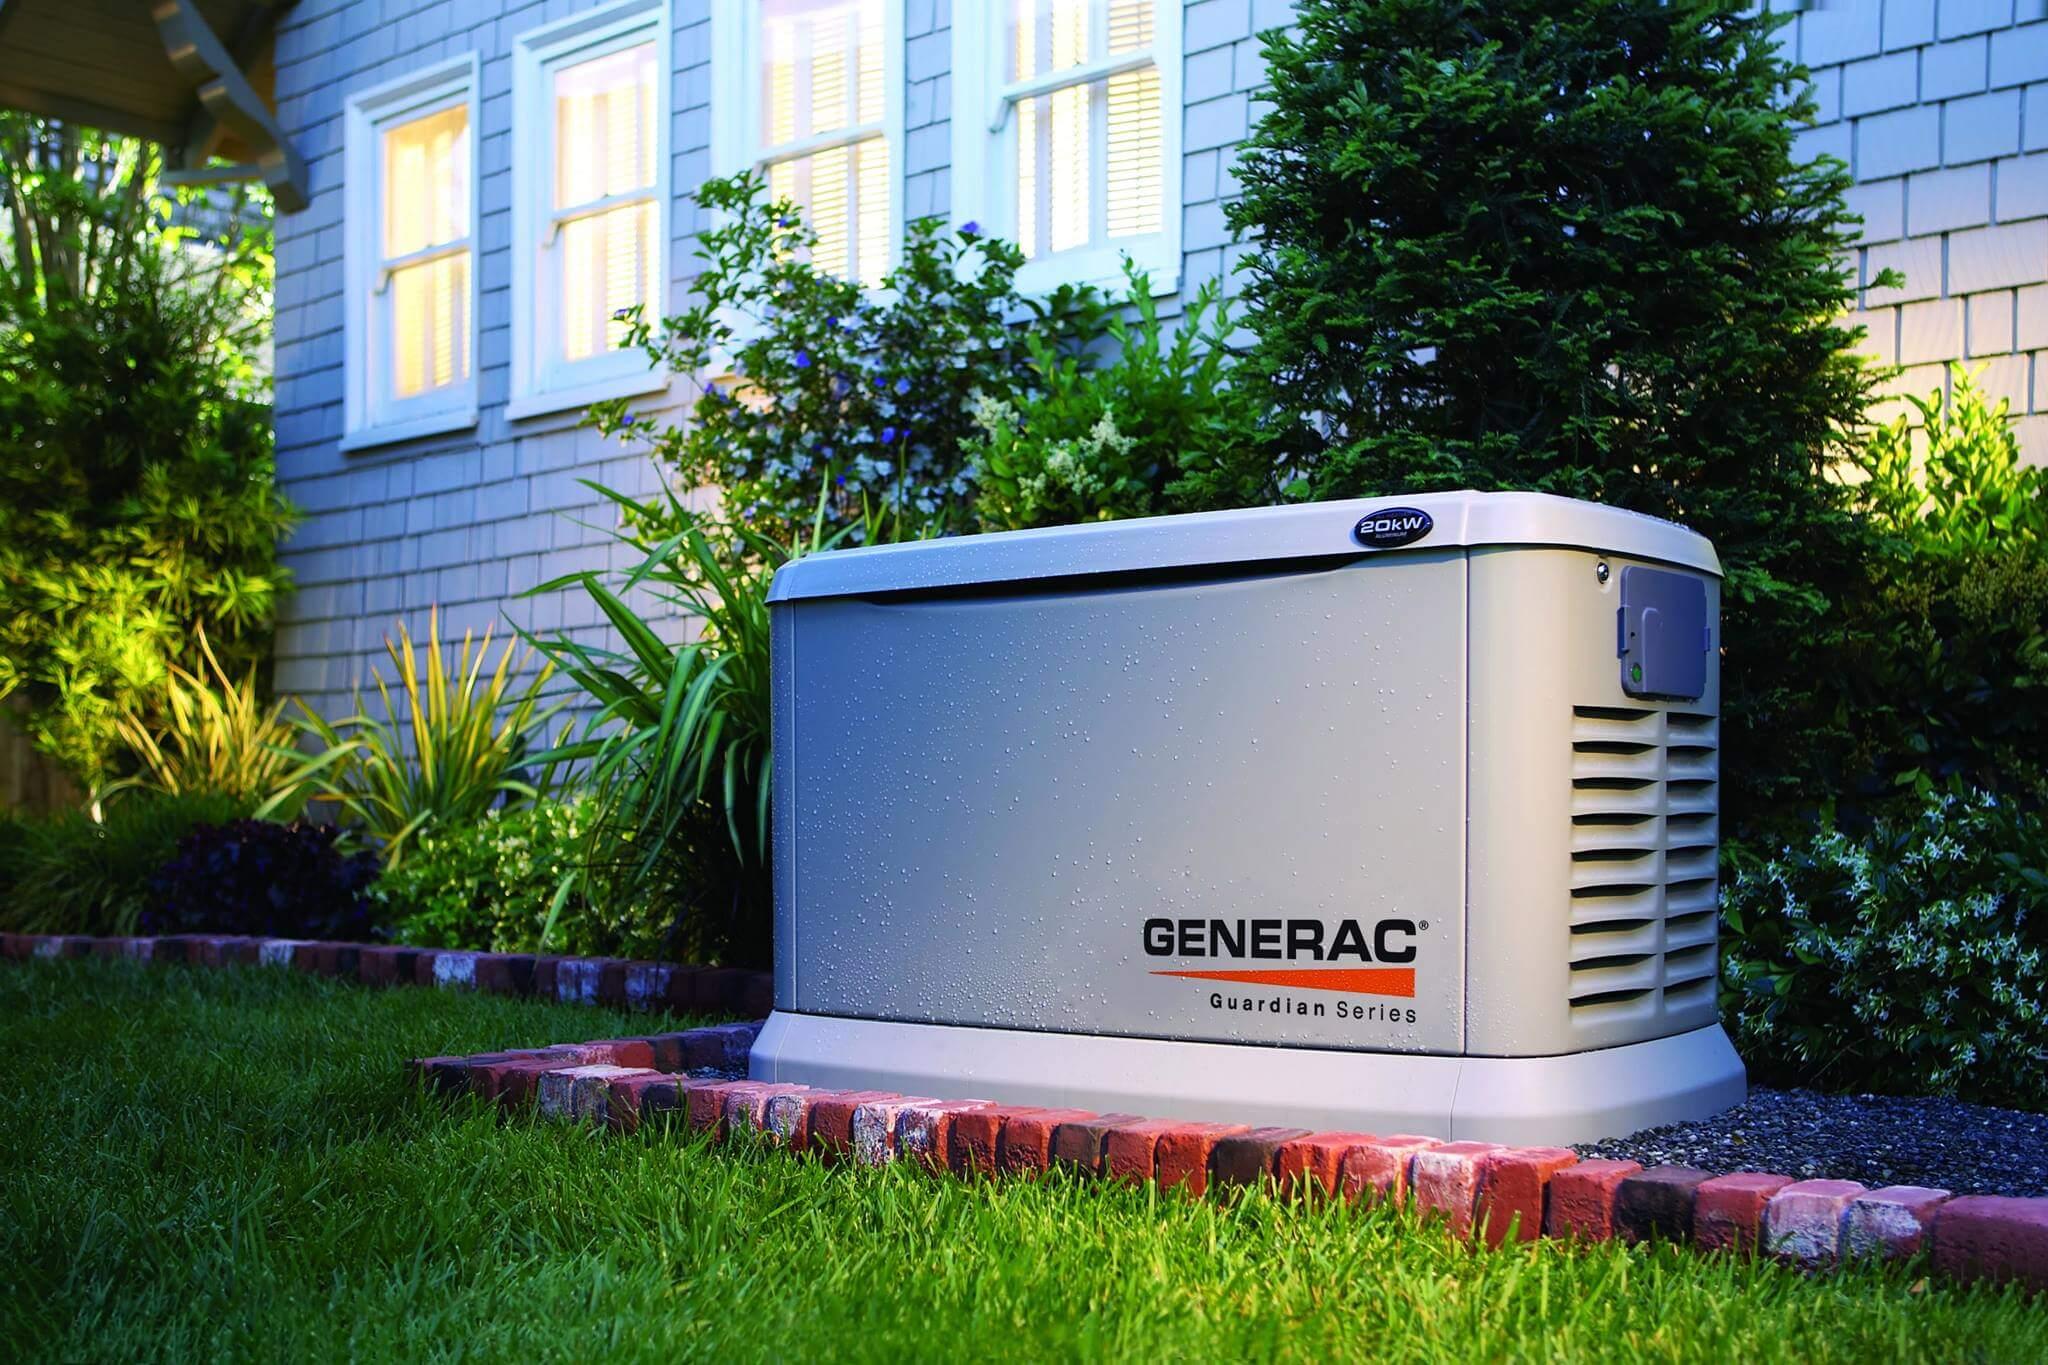 ARK Generator Services